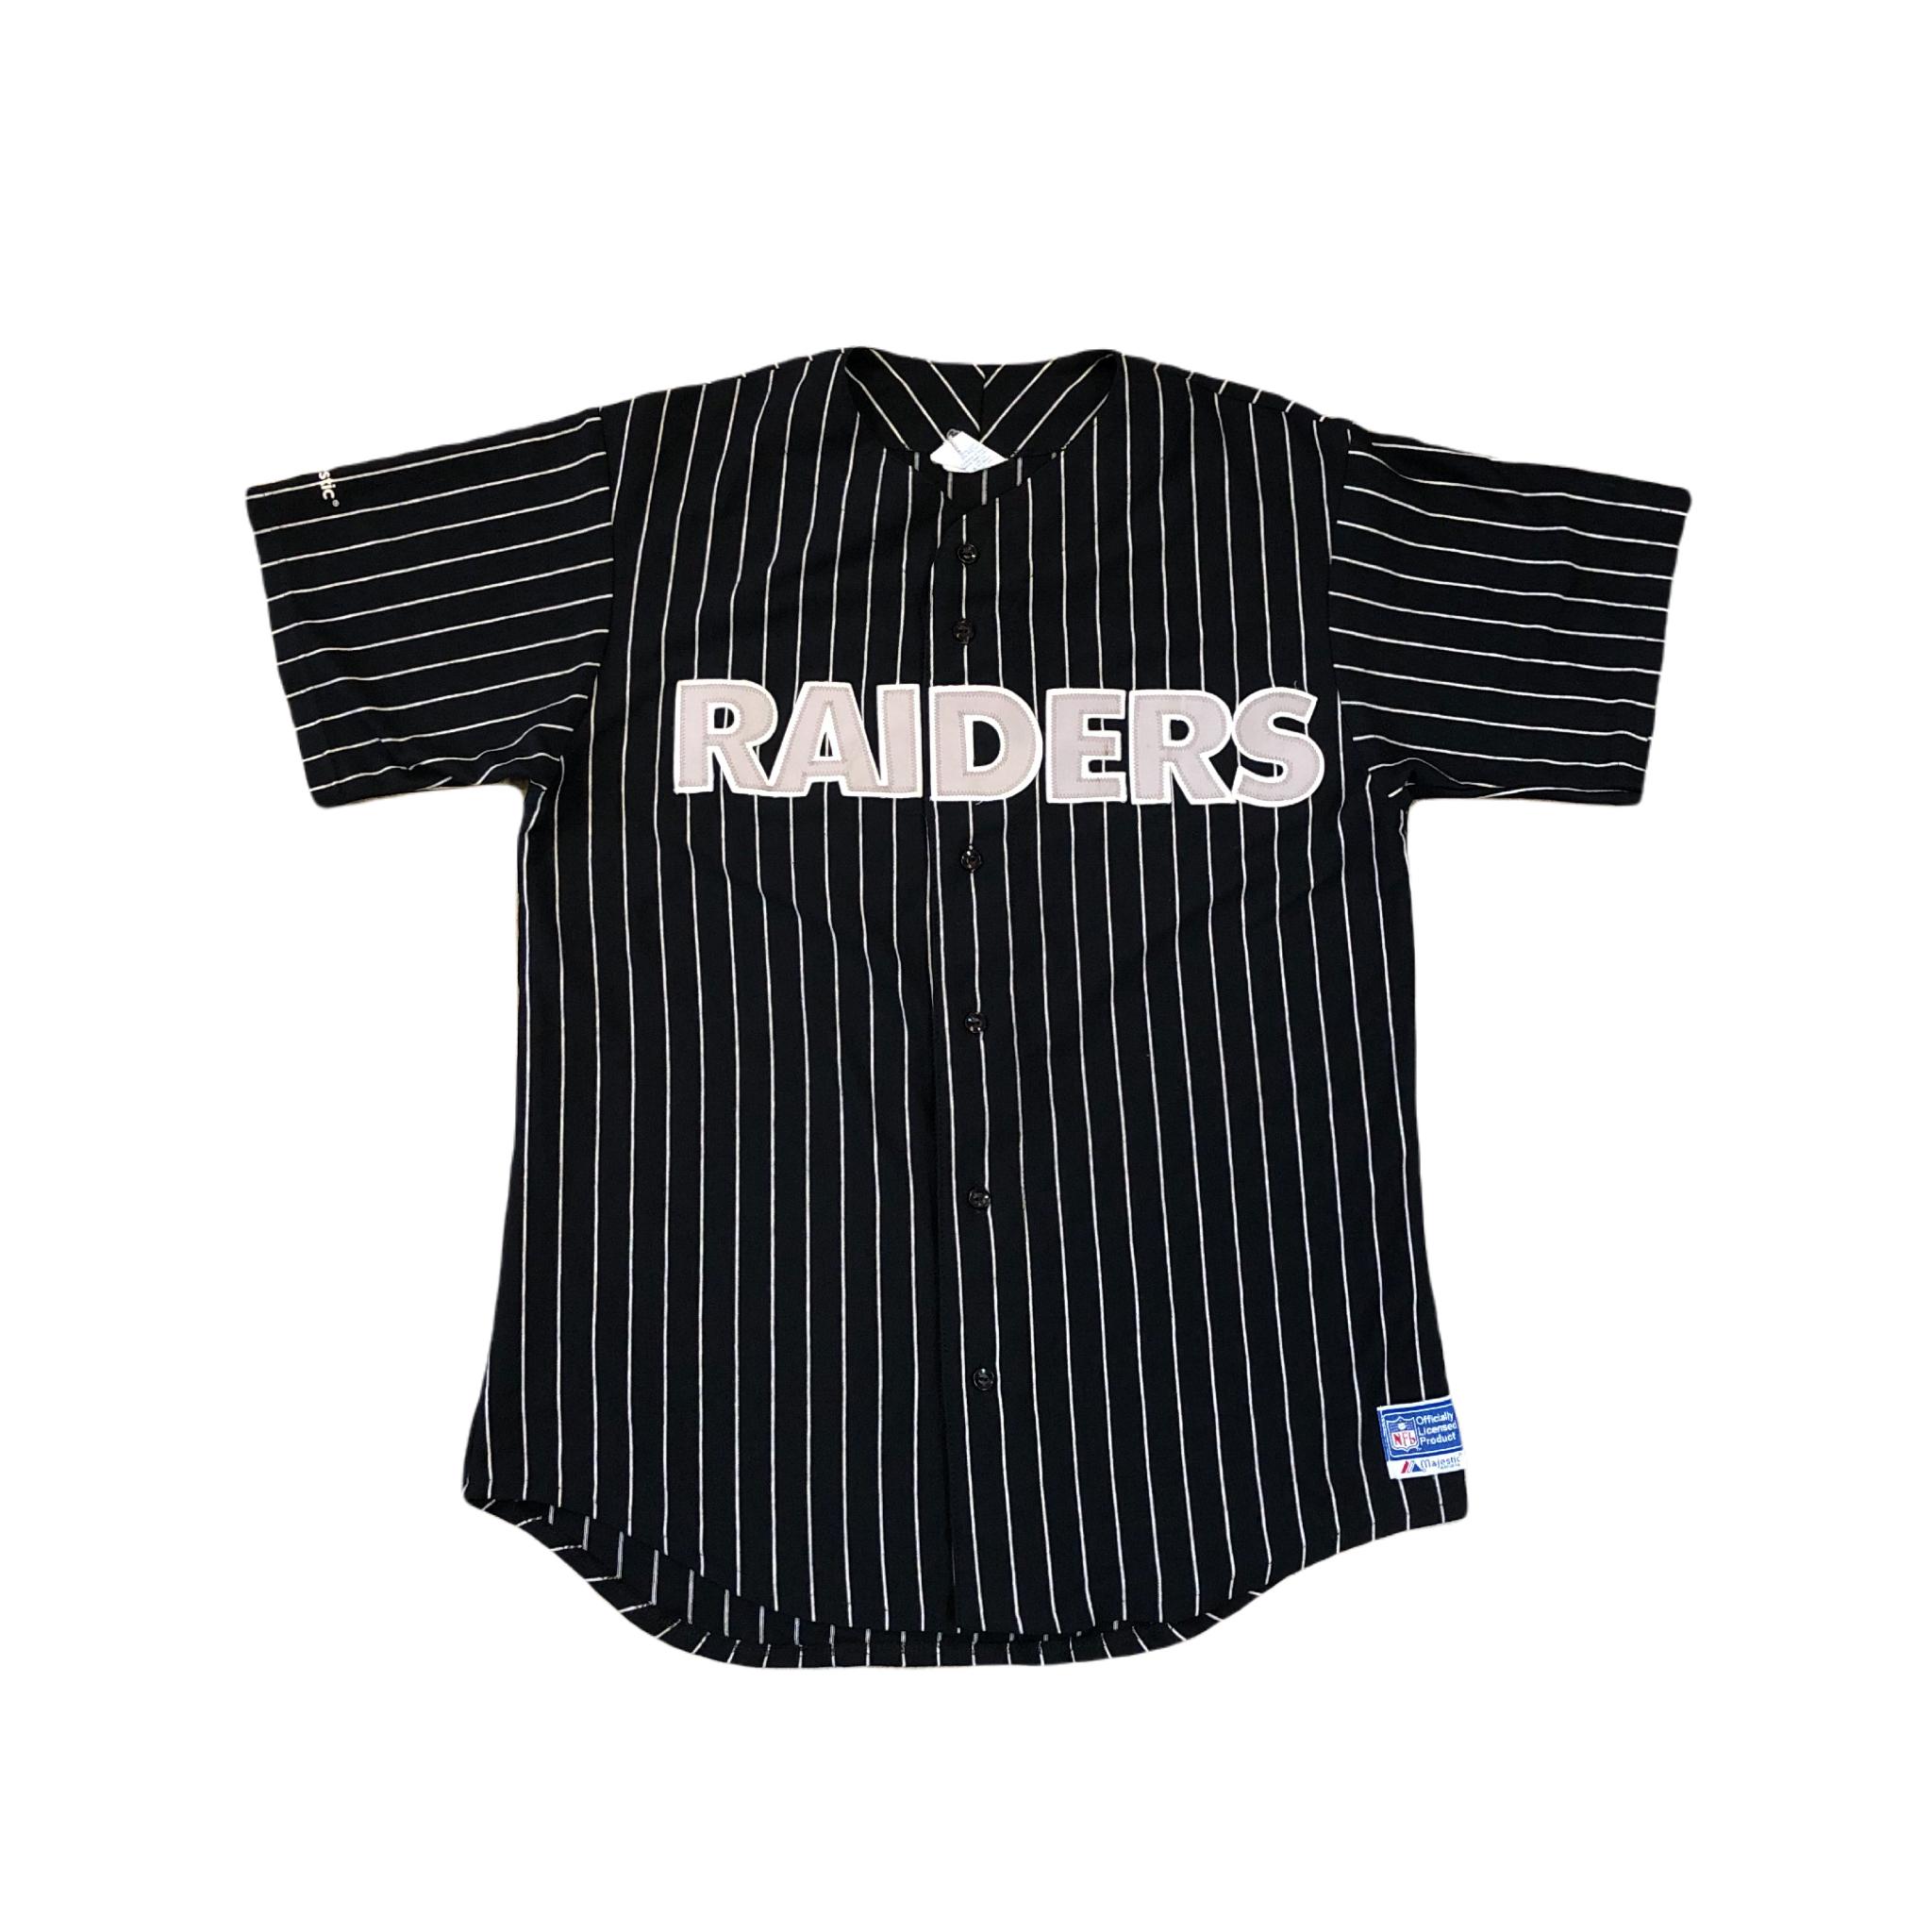 Raiders Baseball Shirts ¥8,800+tax